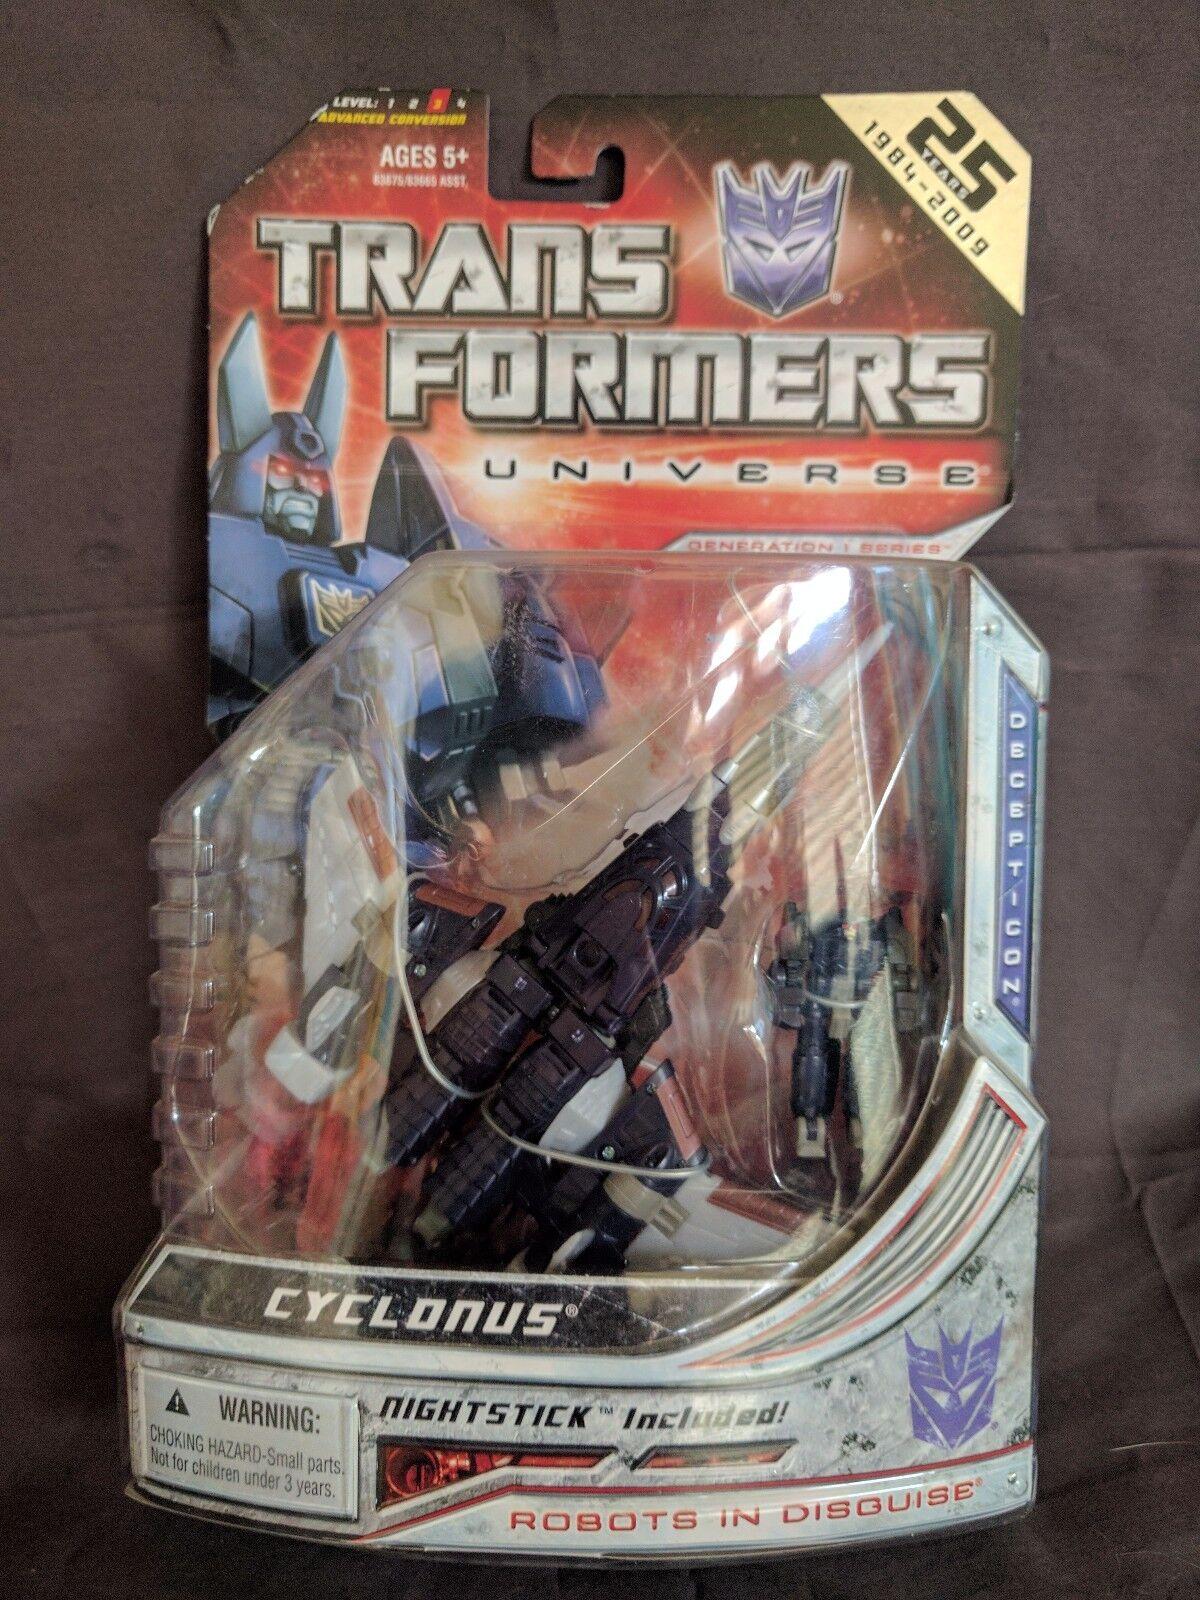 MISB 25 year Anniversary edizione Transformers Universe CYCLONUS Generation 1